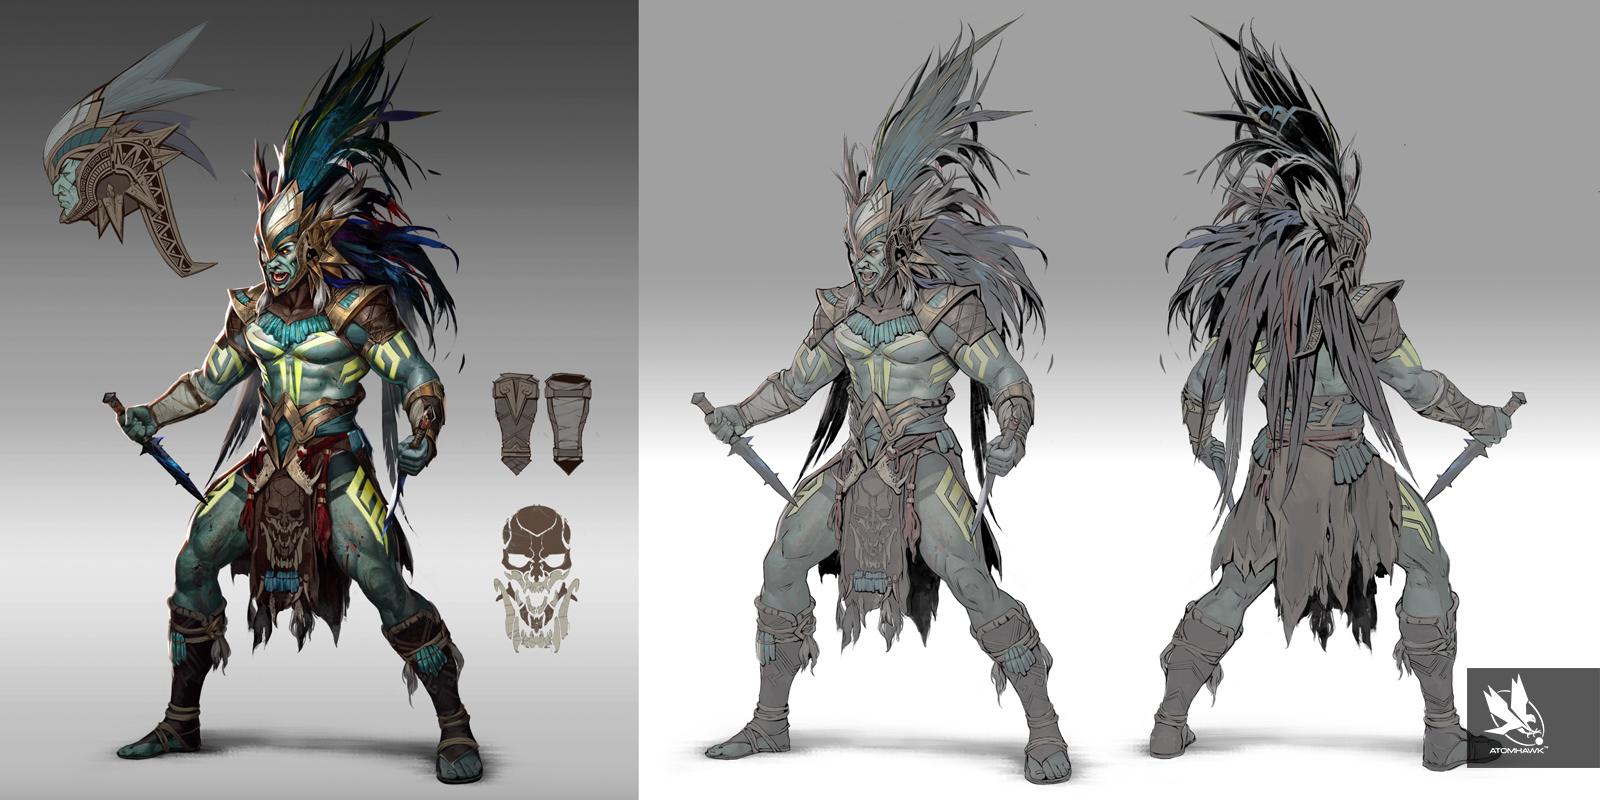 Atomhawk_Warner-Bros-NetherRealm_Mortal-Kombat-11_Concept-Art_Character-Design_Kotal-Kahn_Present_1.jpg